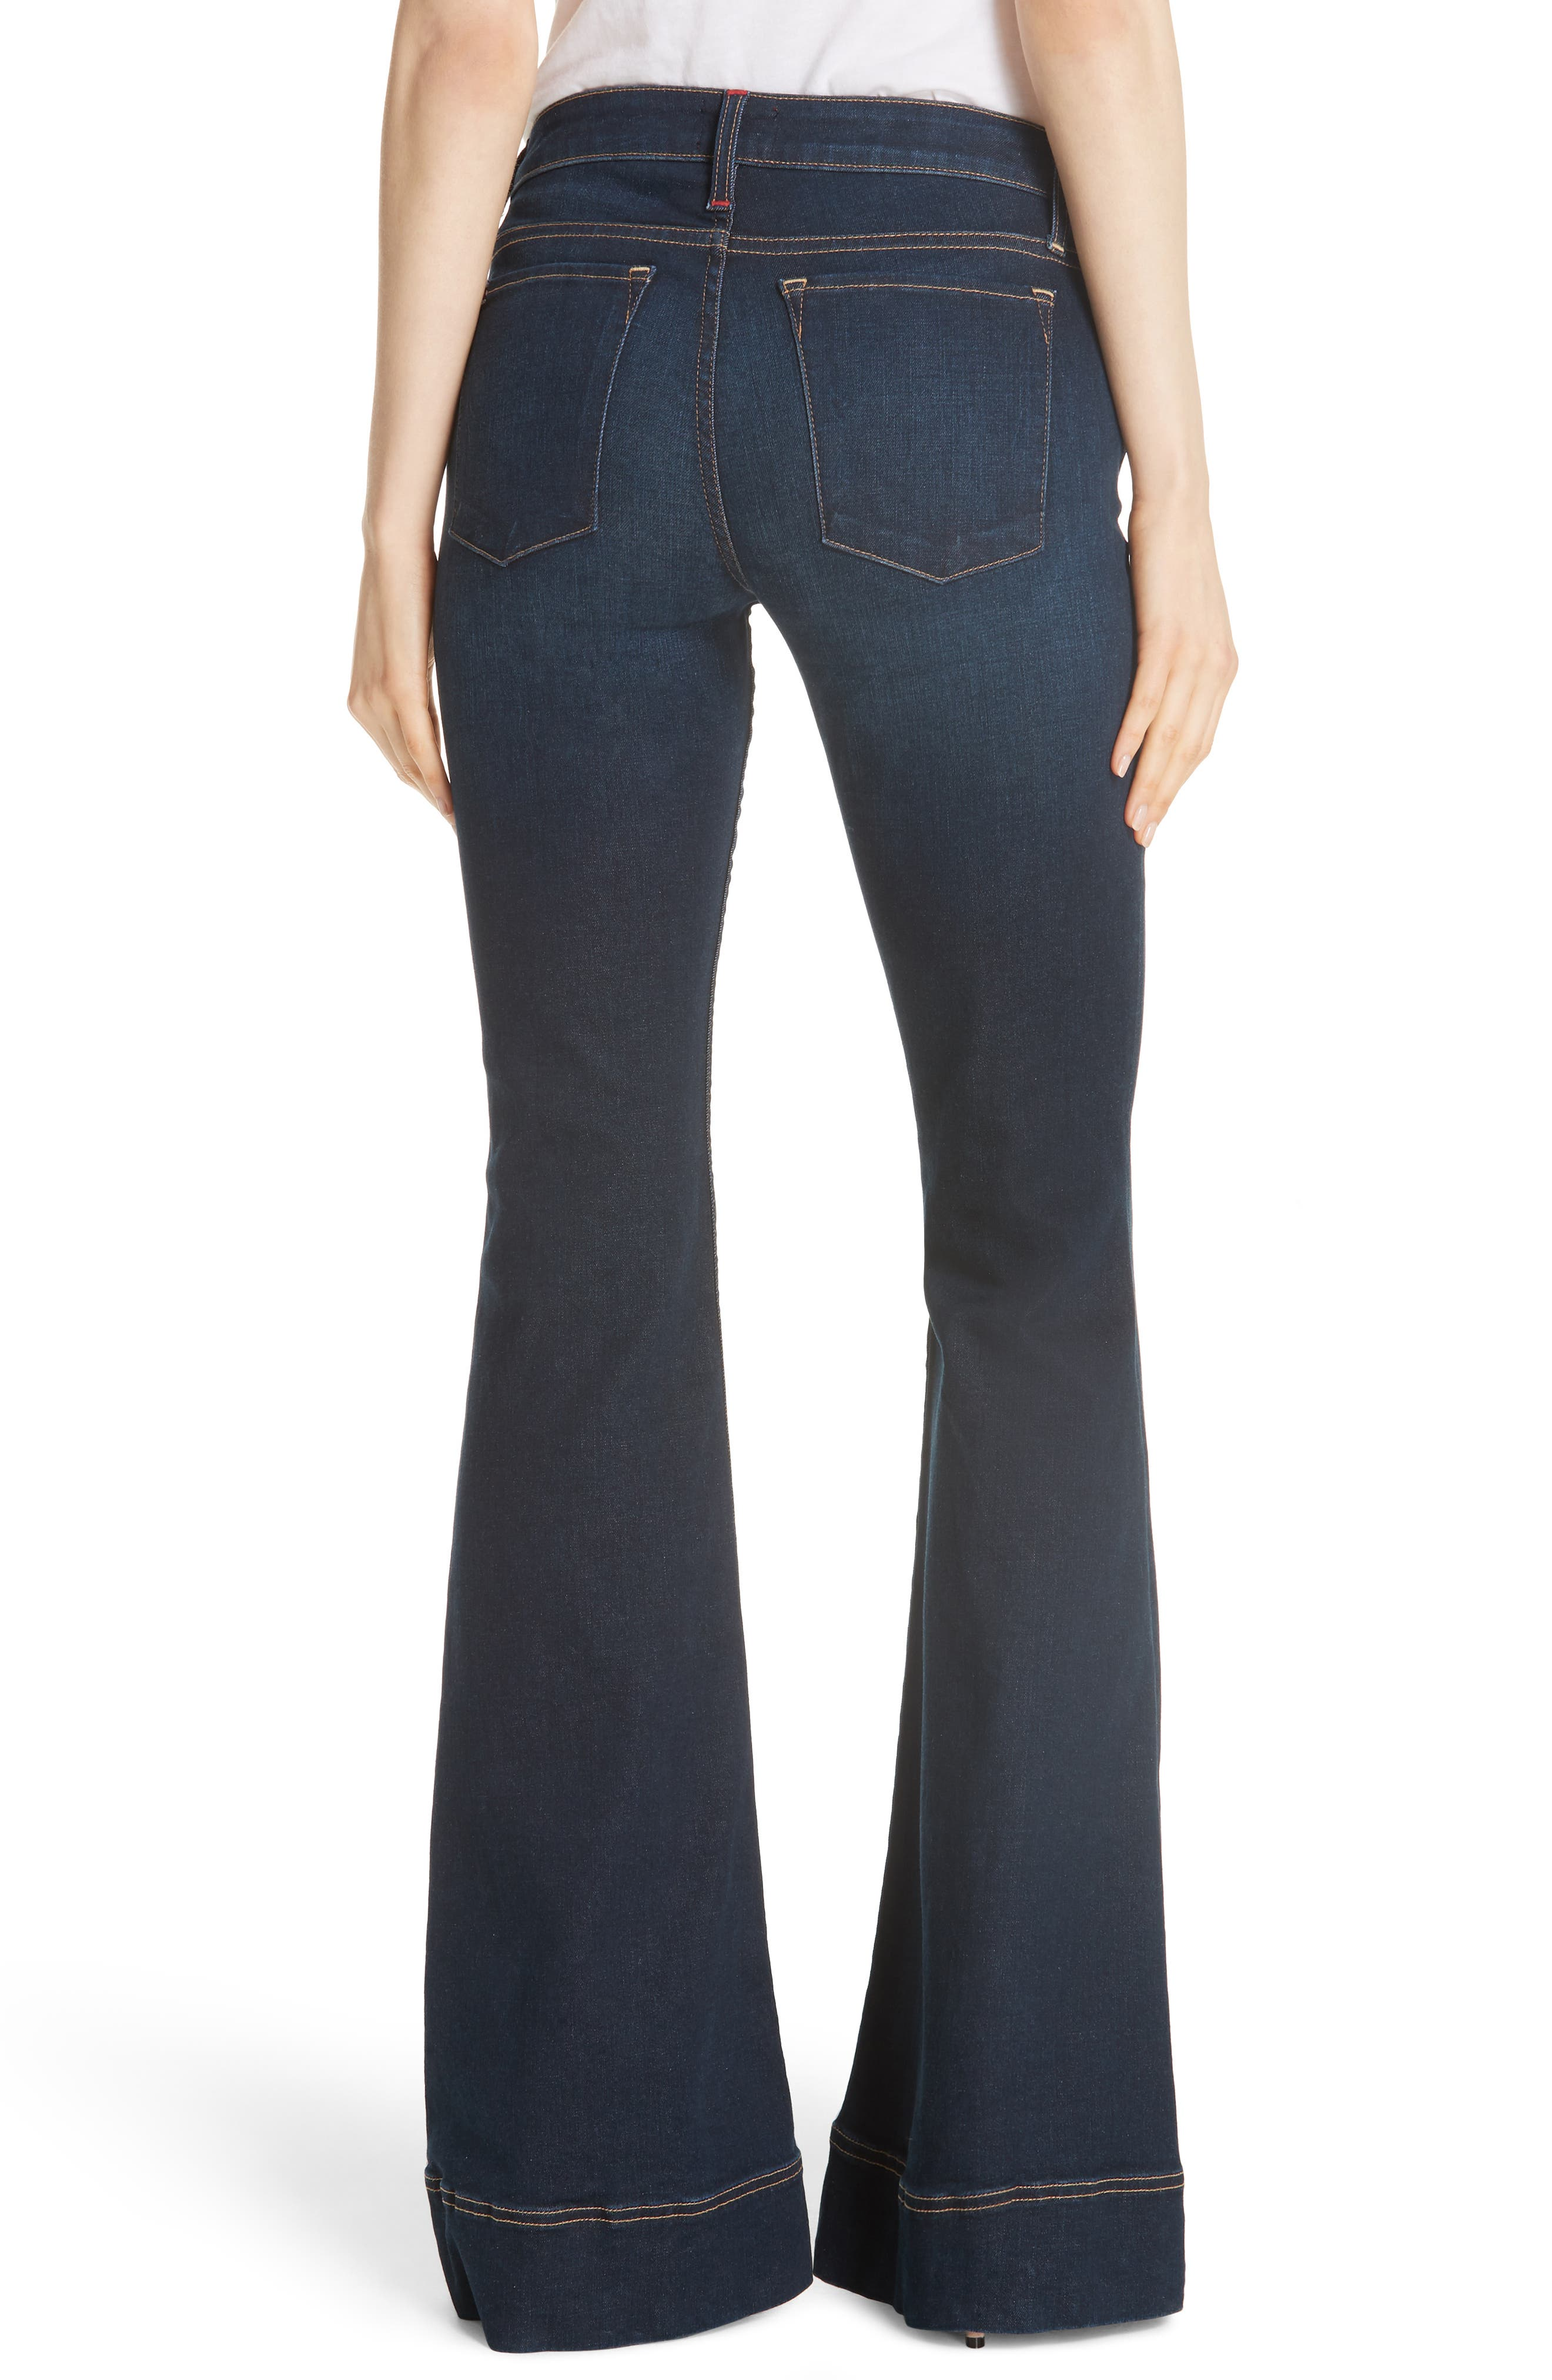 AO.LA Beautiful Bell Bottom Jeans,                             Alternate thumbnail 2, color,                             TRUST ME